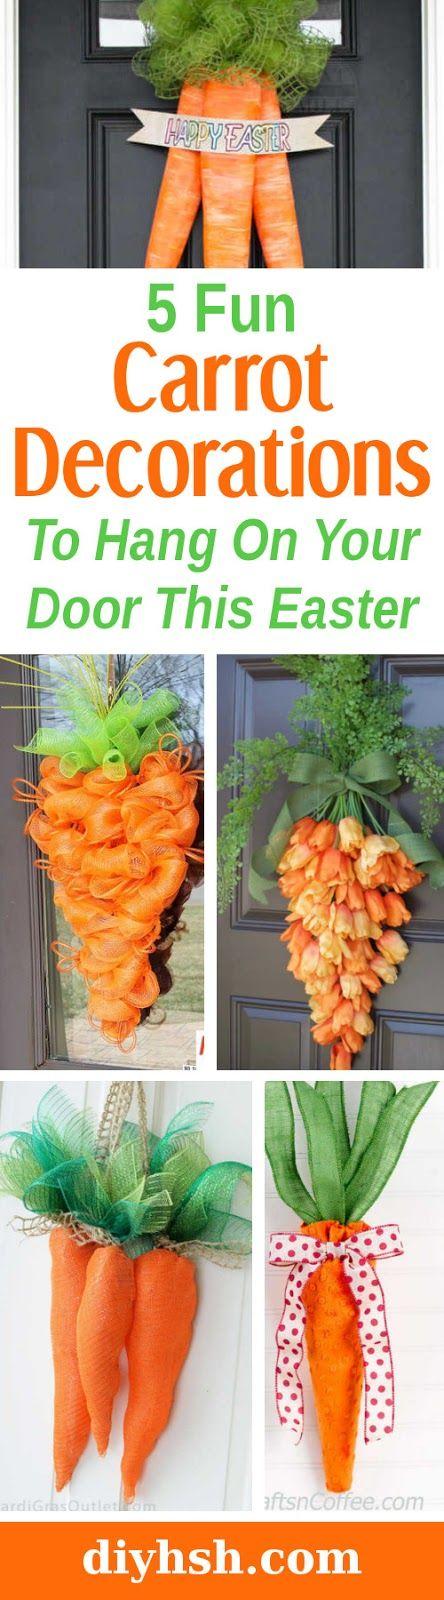 DIY Home Sweet Home: 5 DIY Carrot Easter Wreaths